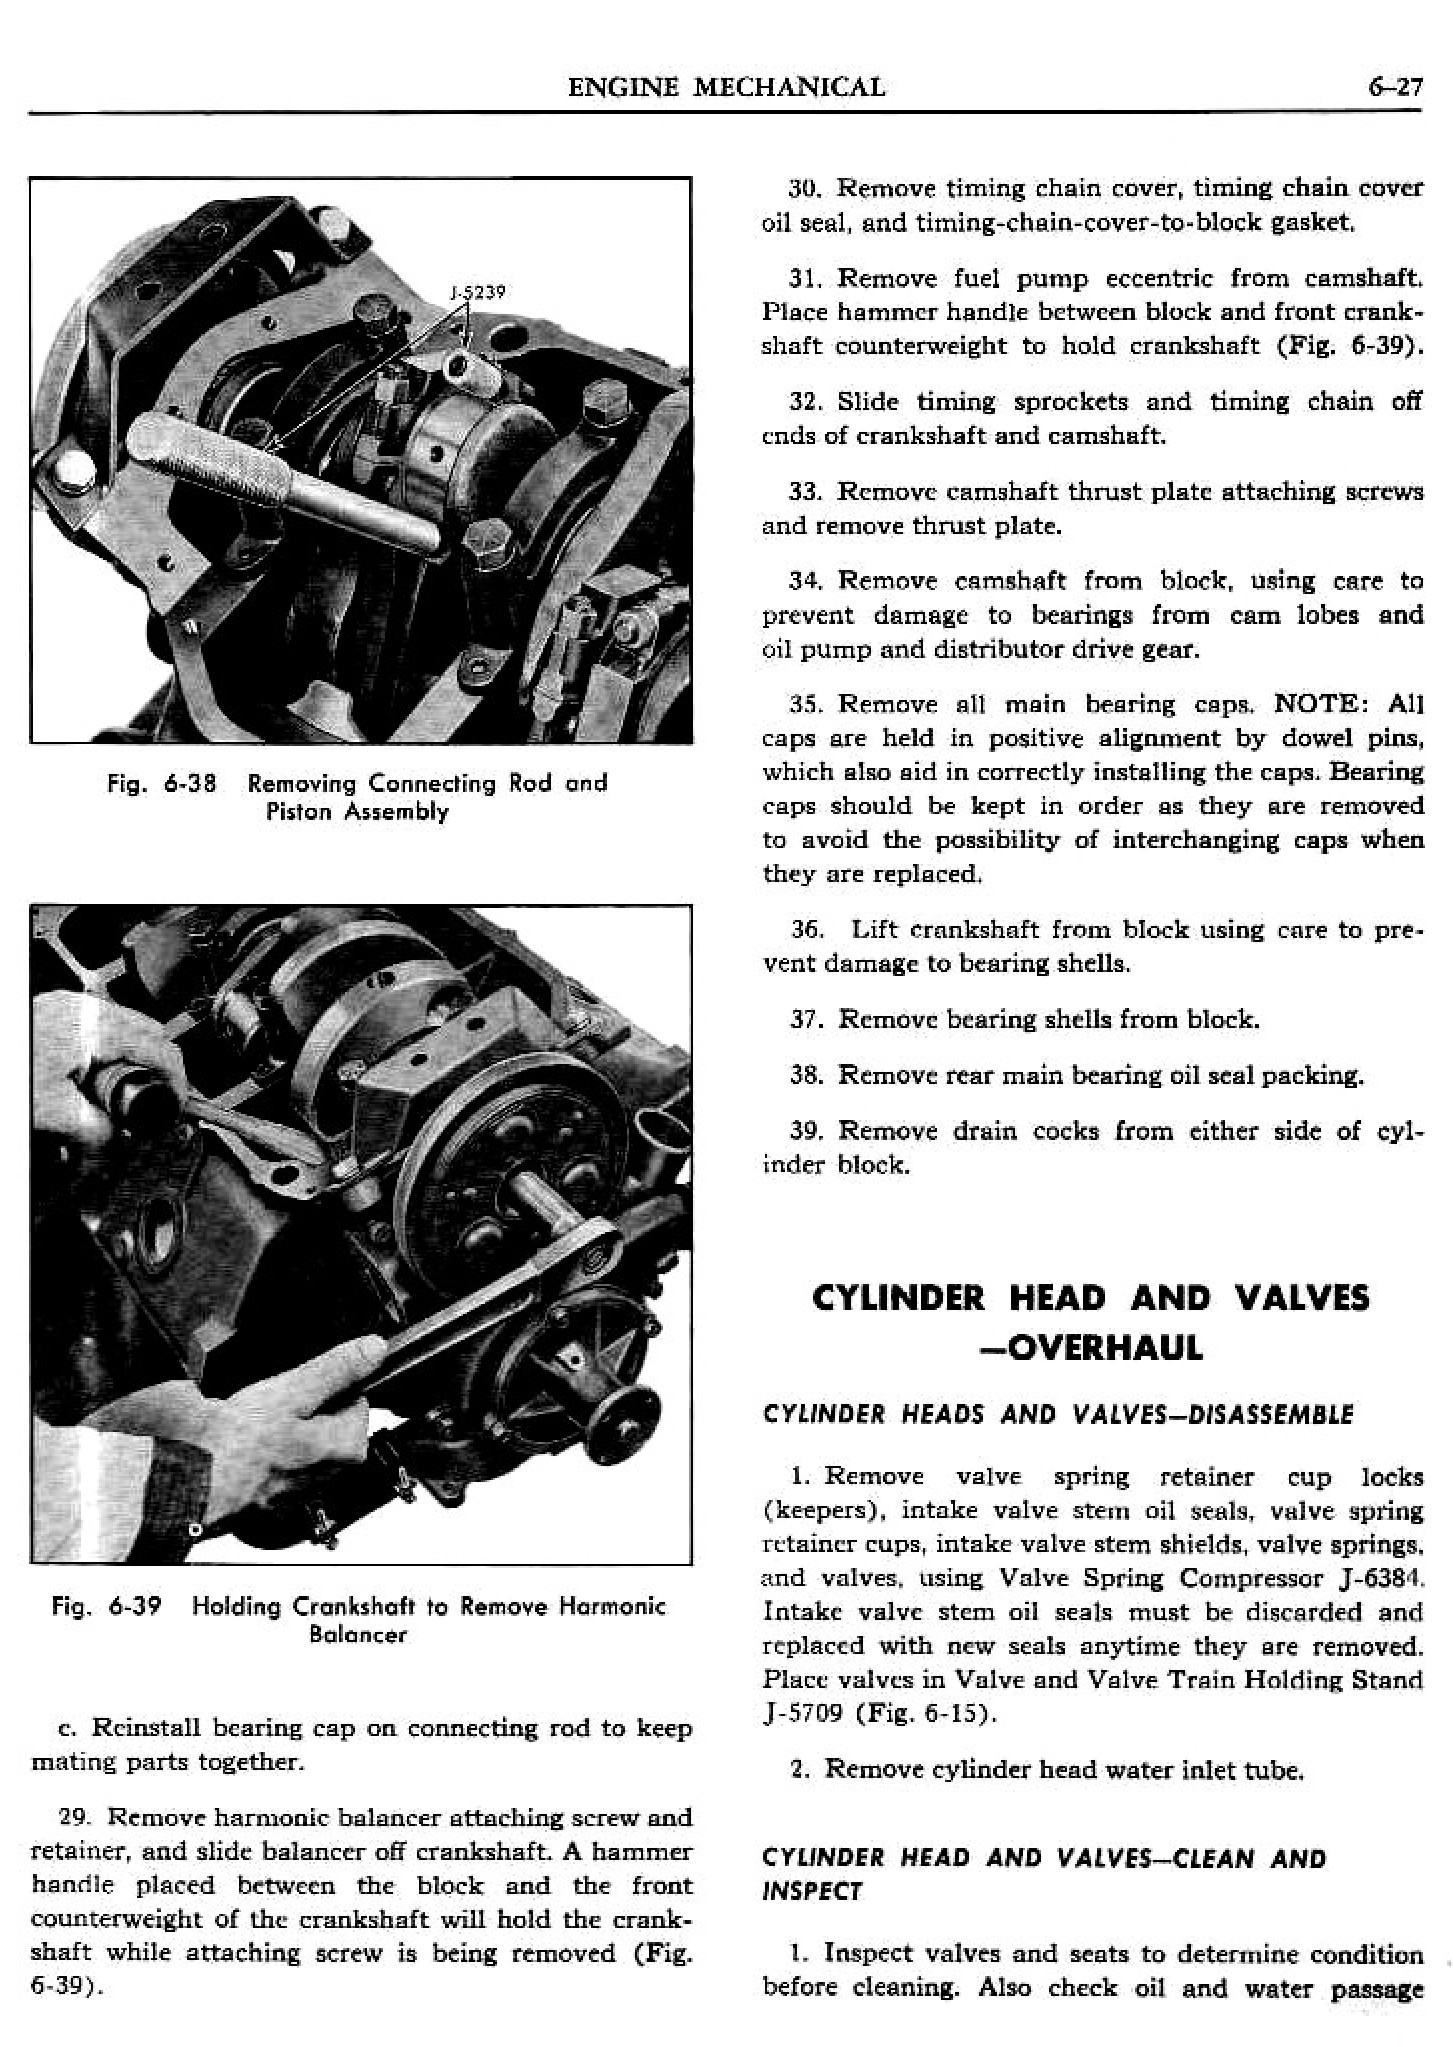 1956 Pontiac Shop Manual- Engine Page 28 of 56